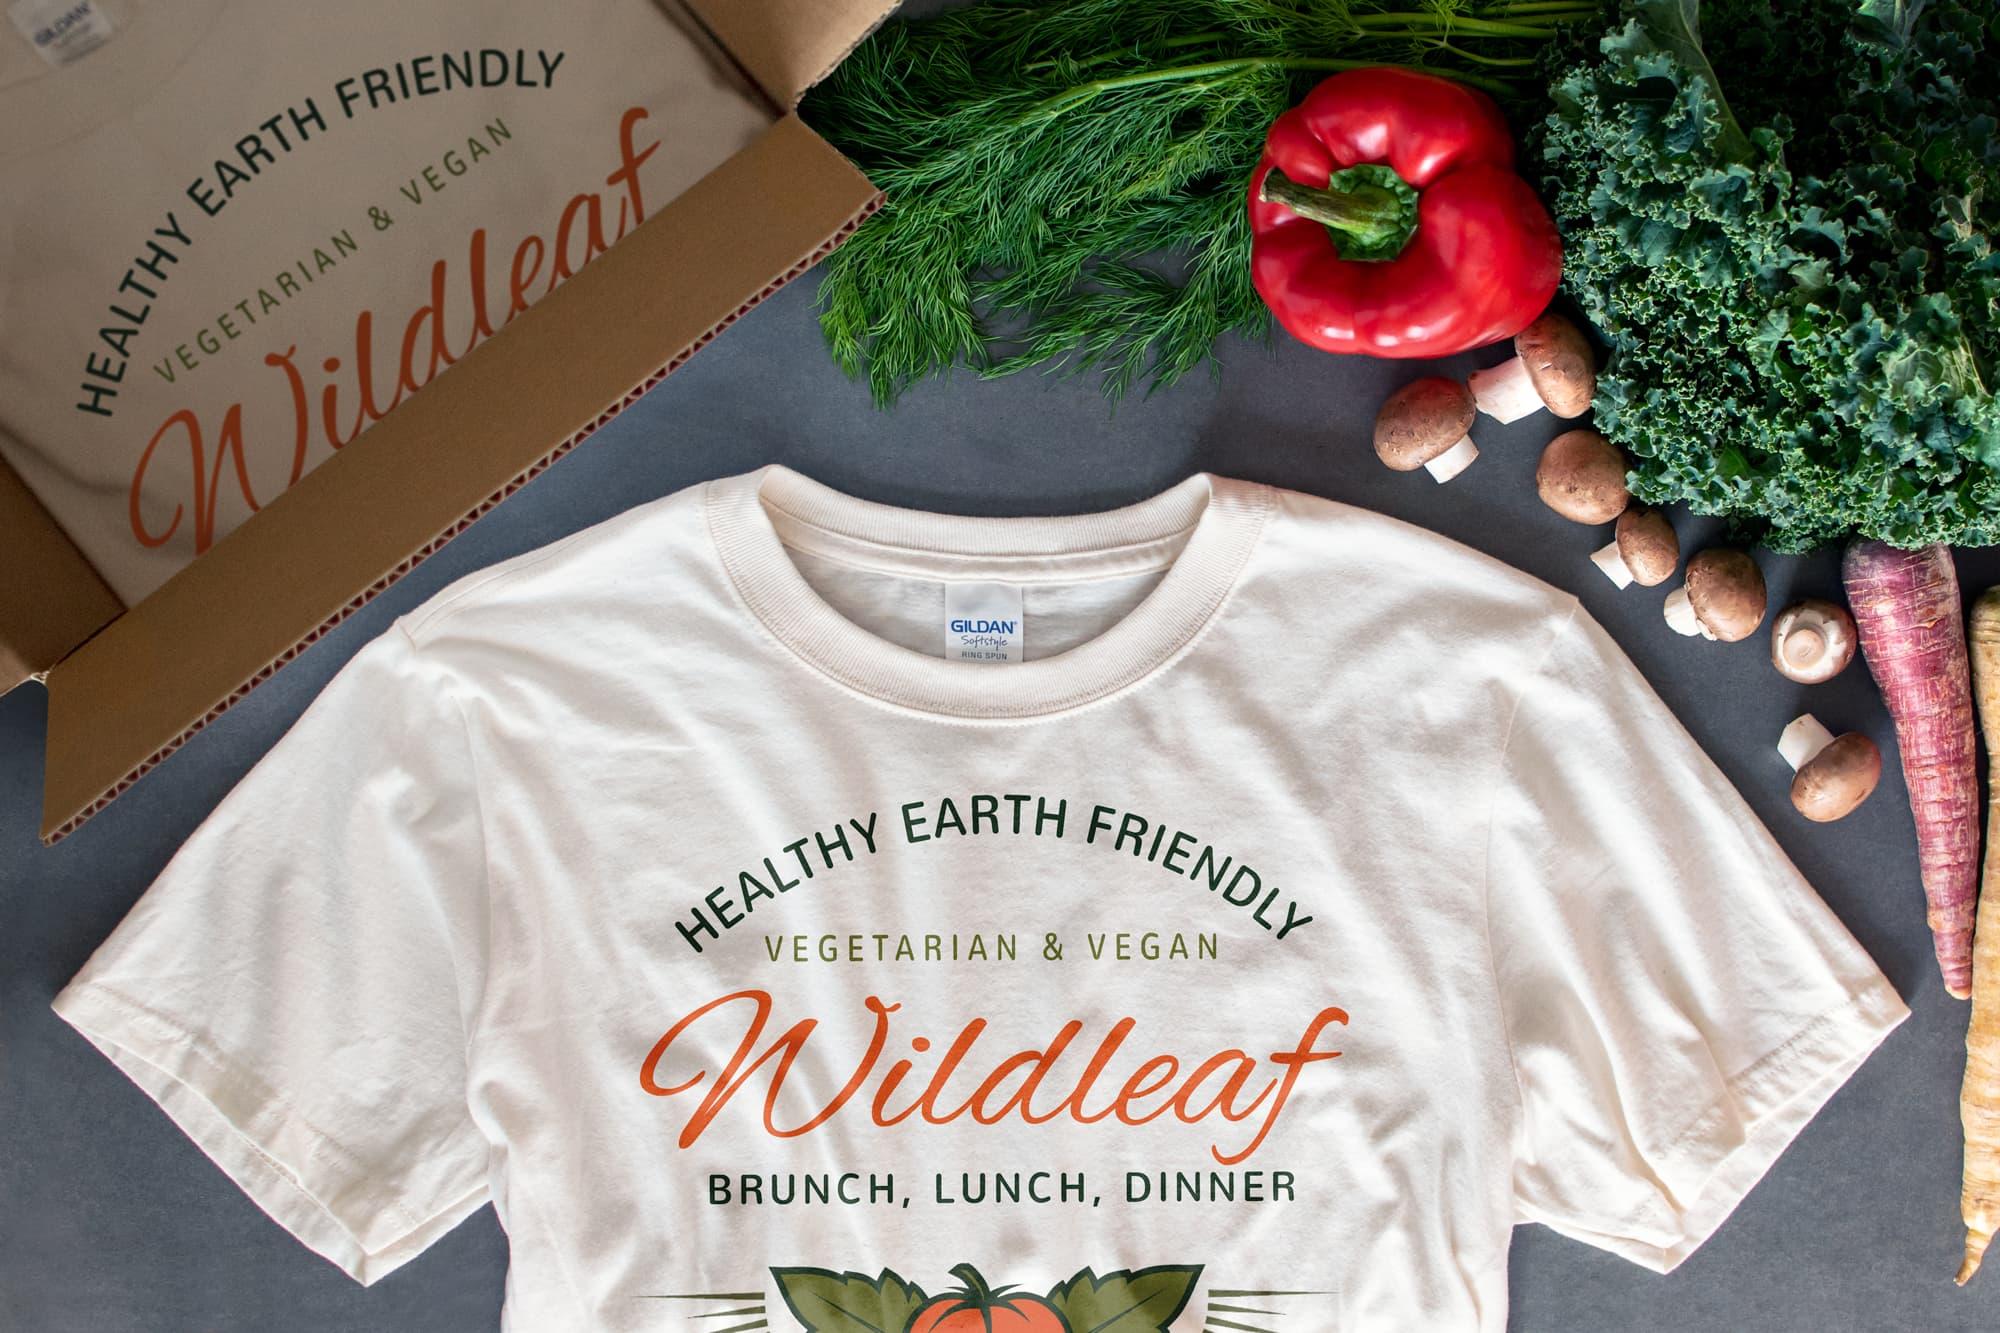 Flatlay showing restaurant receiving custom t-shirts.